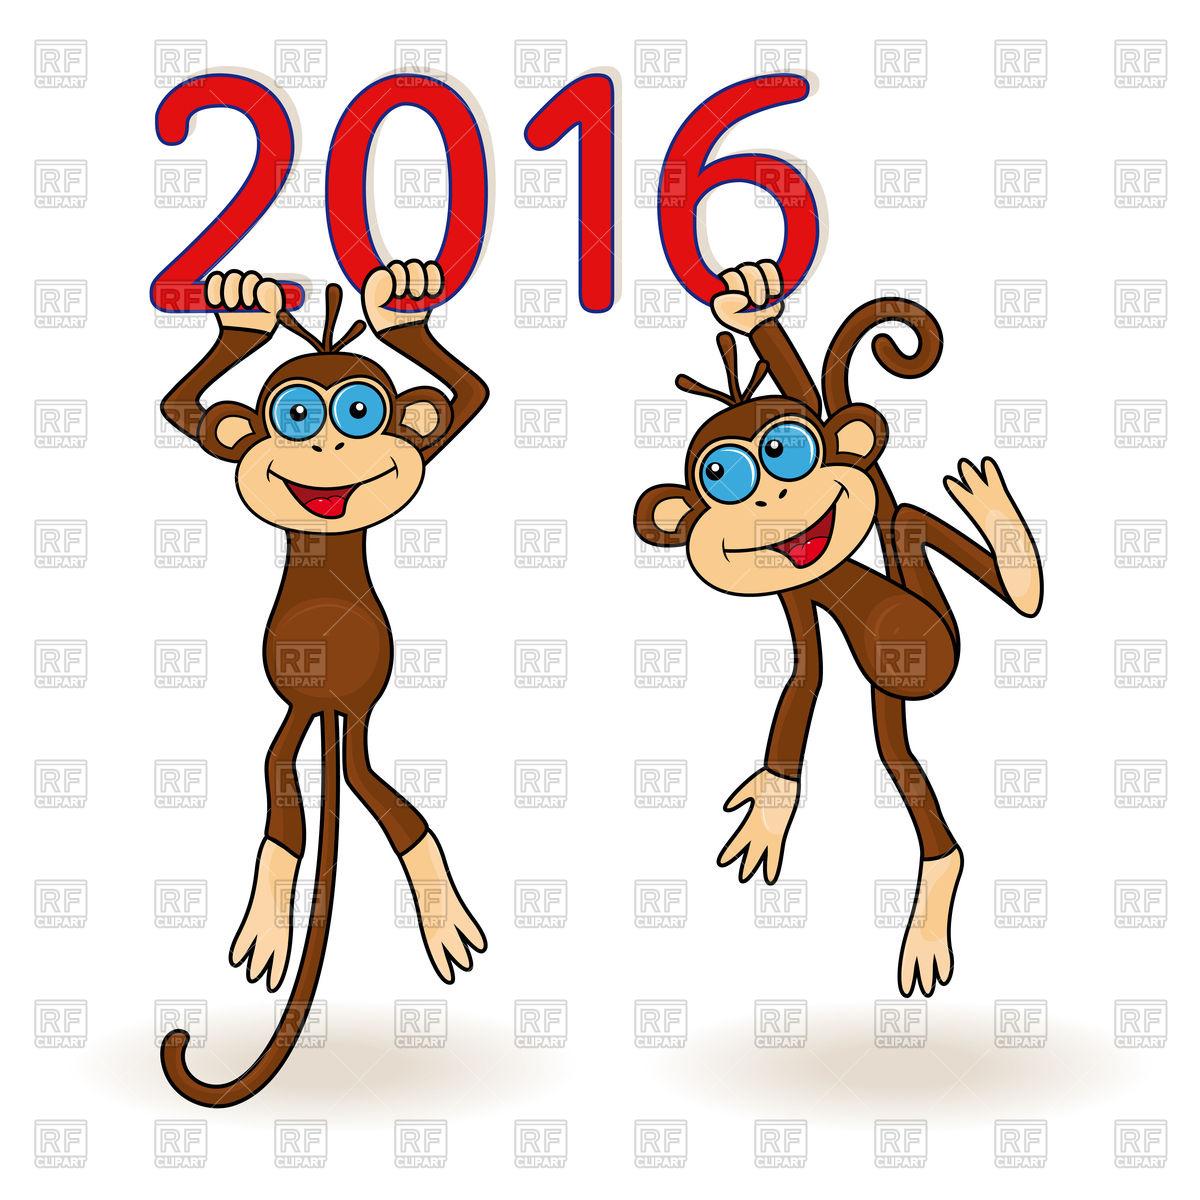 1200x1200 Two Funny Monkeys